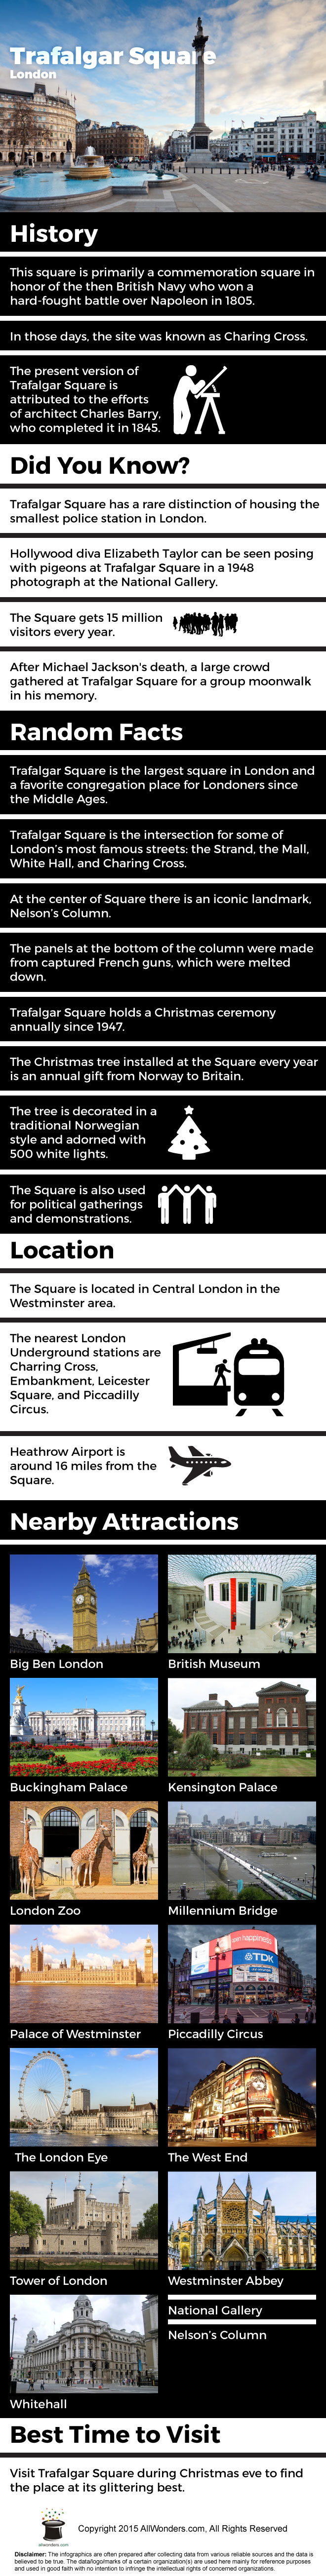 Trafalgar Square Infographic